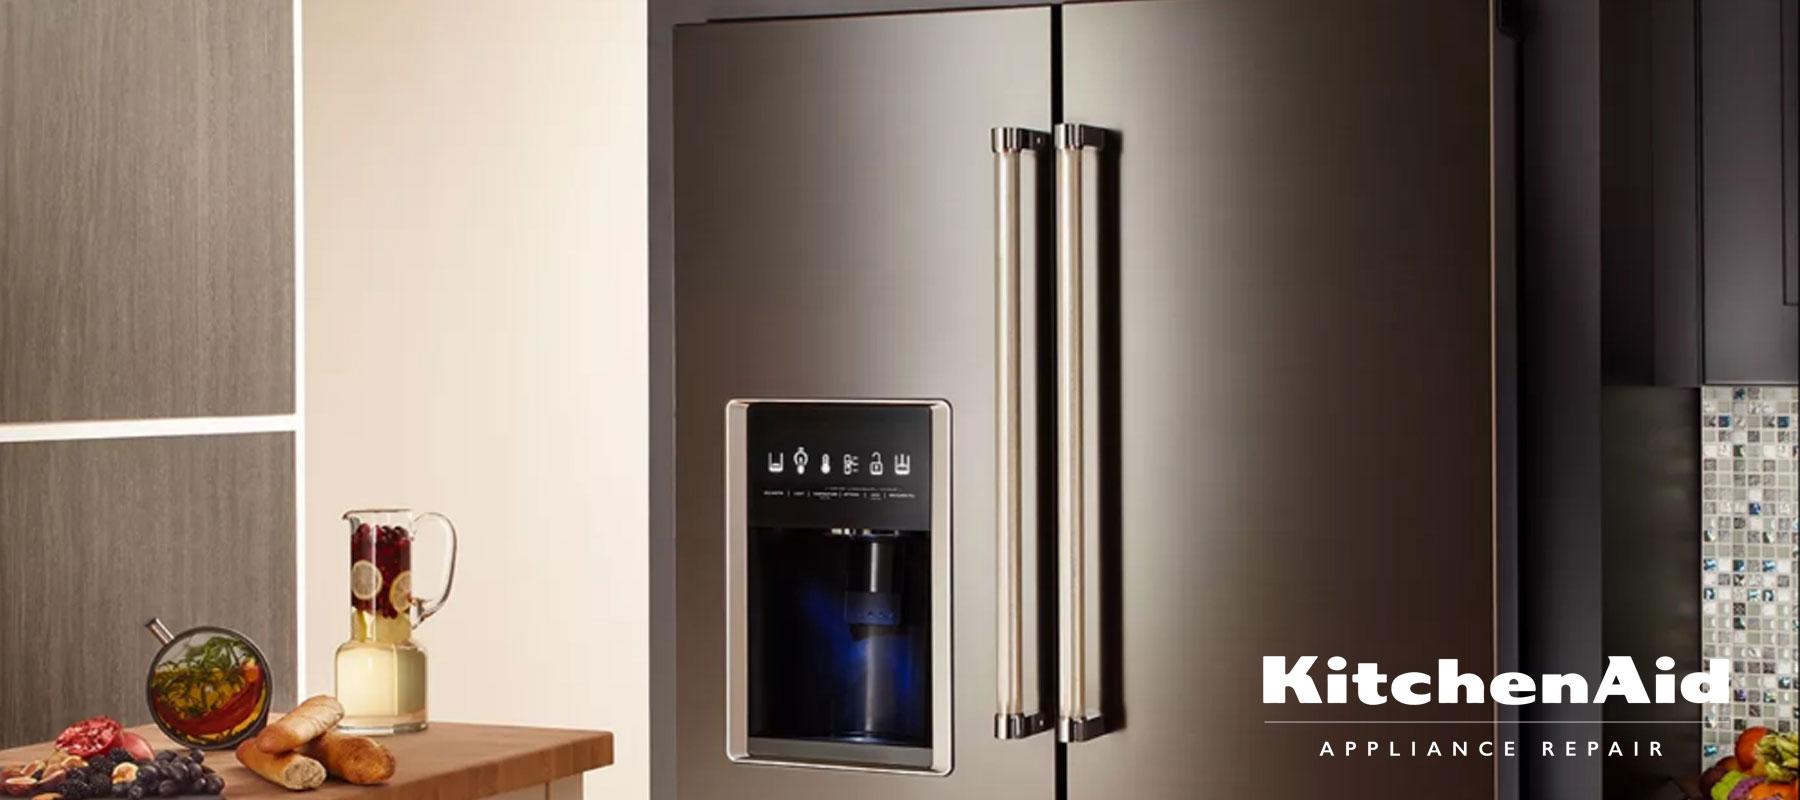 Practical Kitchenaid Fridge Repair Tips | KitchenAid Appliance Repair Professionals